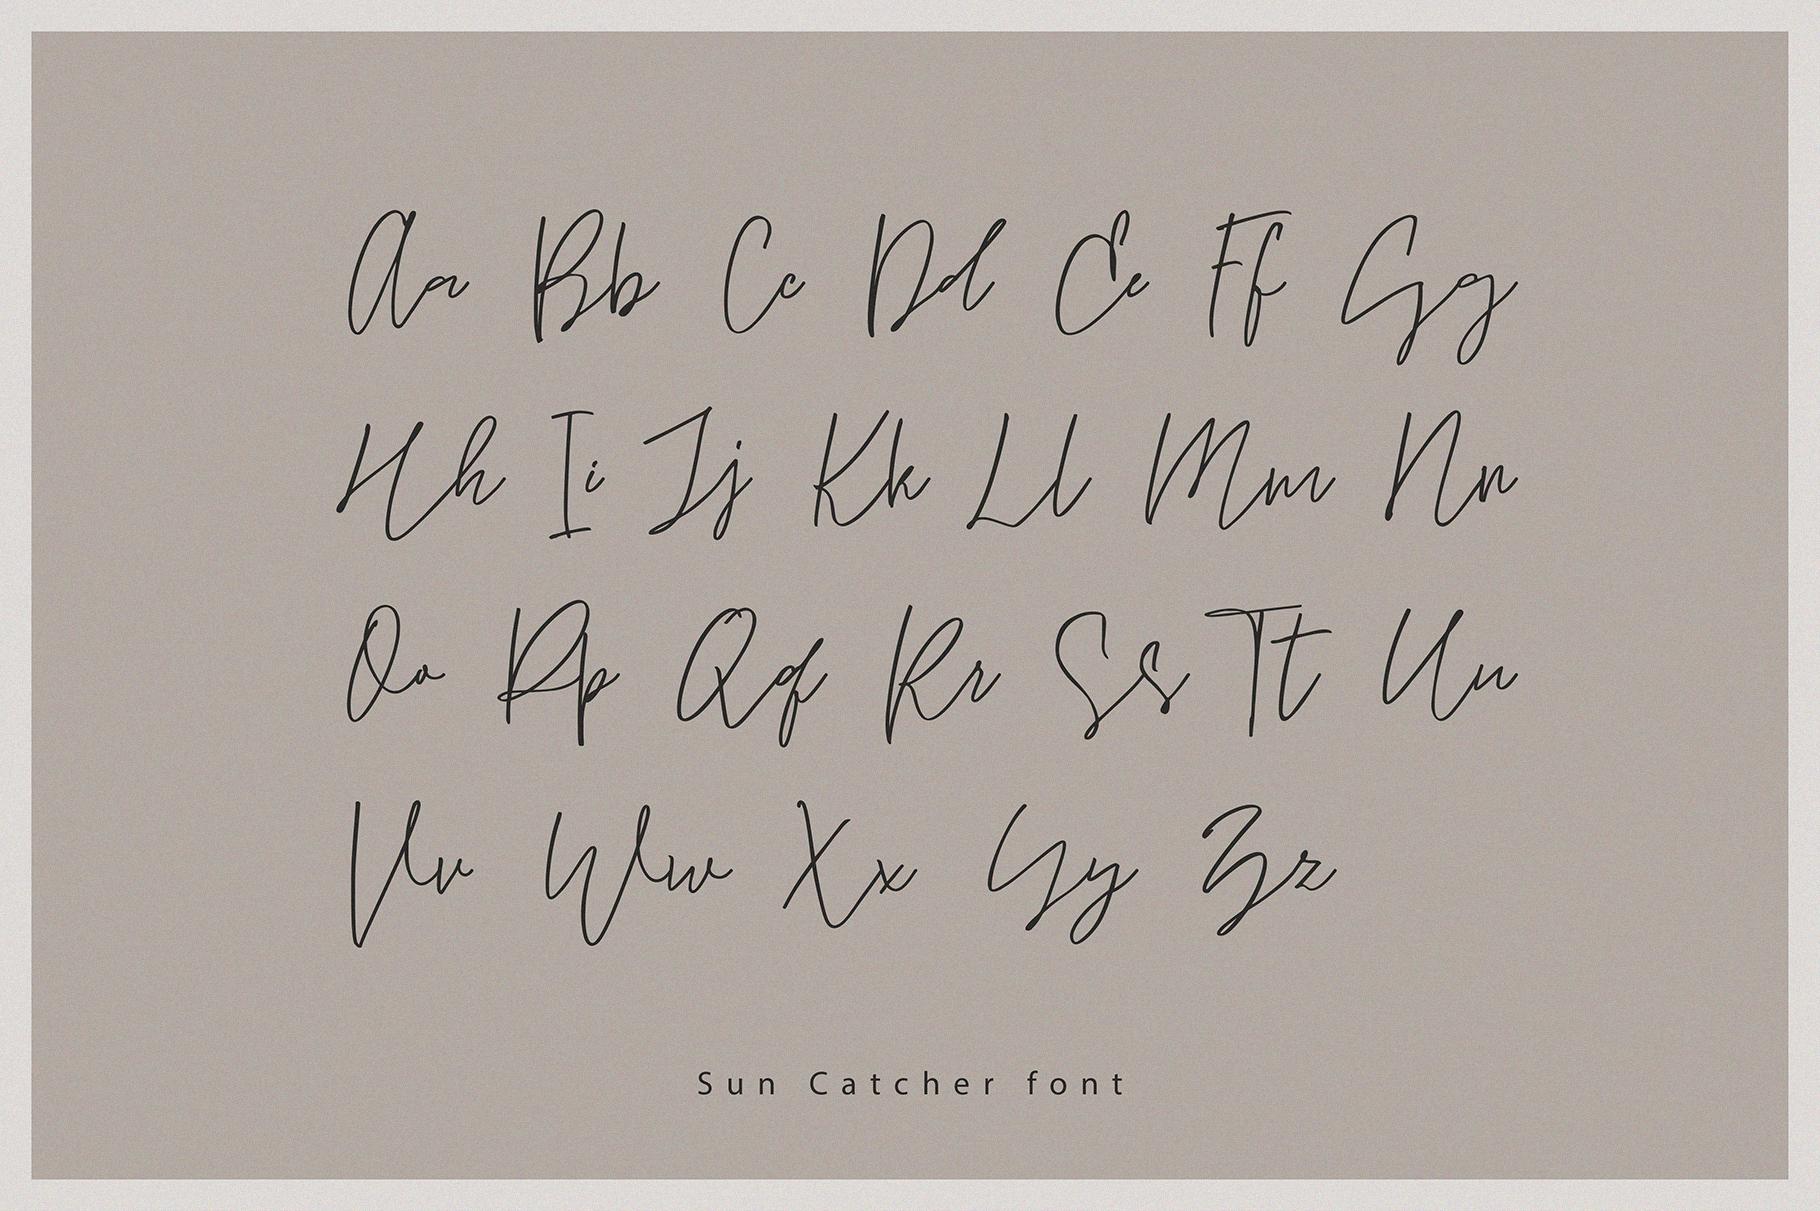 Sun Catcher   Multilingual Handwritten Script Font example image 2